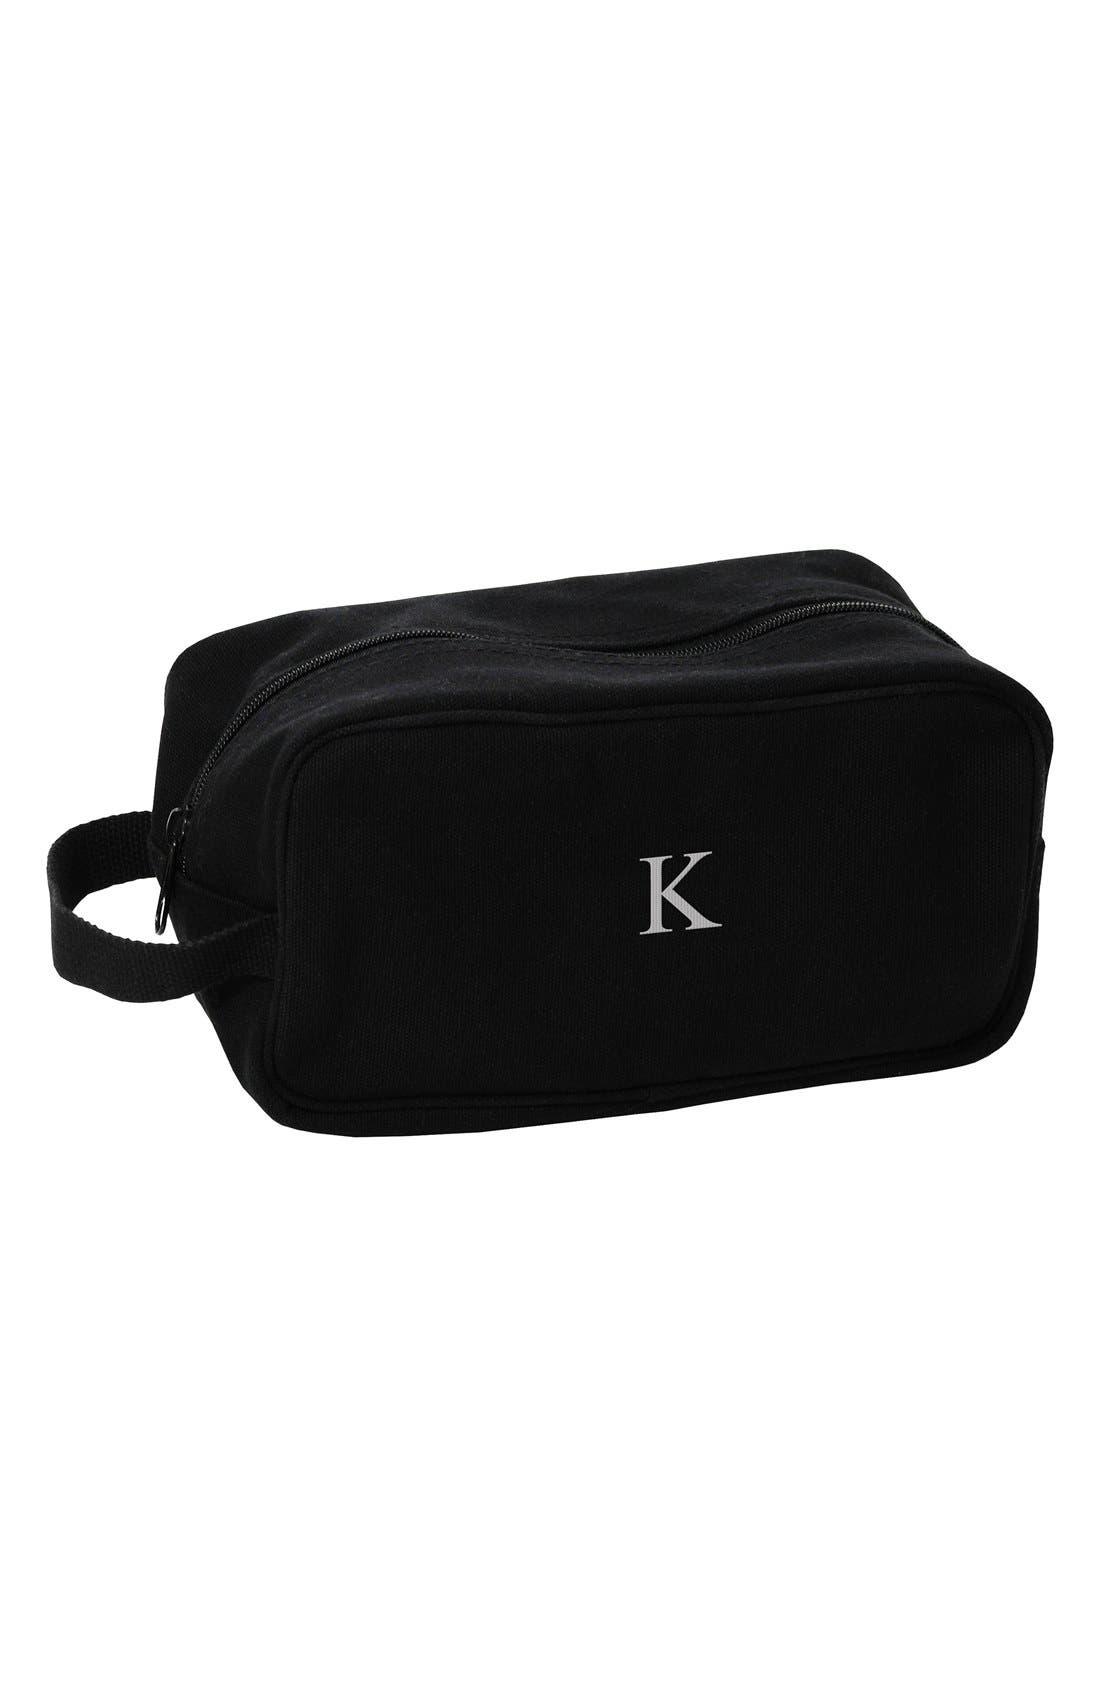 Monogram Canvas Travel Bag,                         Main,                         color, K